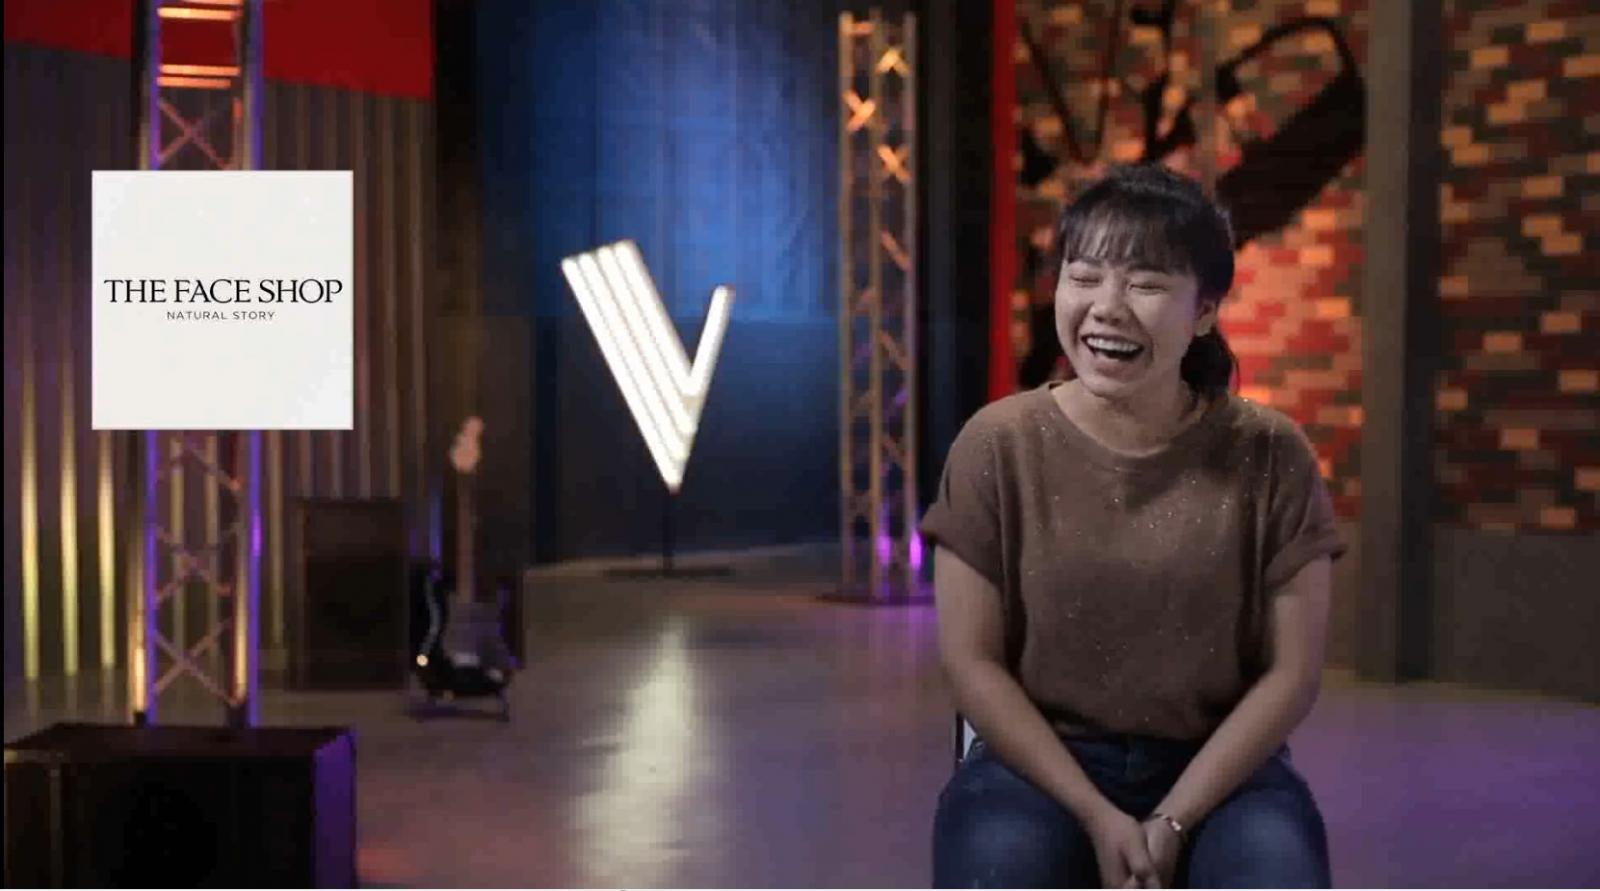 """The Voice 2018"" เดือด ""สาวน้อยร้องเกะ-อดีตแชมป์เดอะวอยซ์คิดส์"" ตบเท้าเข้ารอบ"